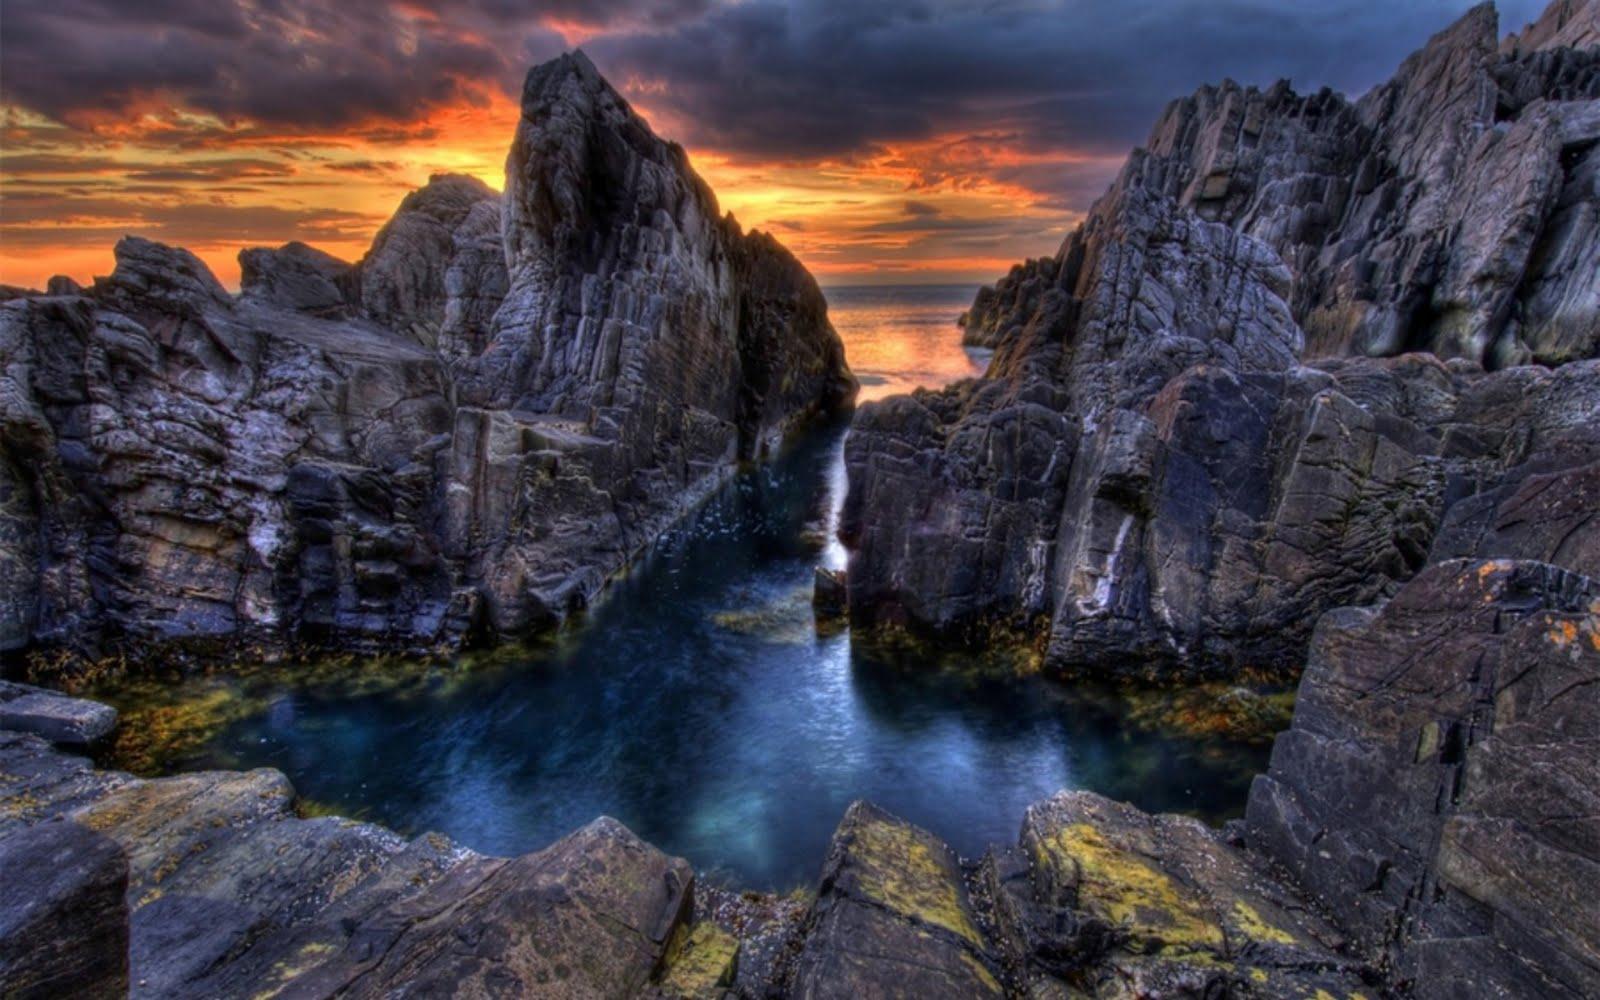 https://2.bp.blogspot.com/-xKJP77VGeEg/TmIAFsCXq2I/AAAAAAAADx0/ahkQdLHj_ZI/s1600/amazing_landscape.jpg